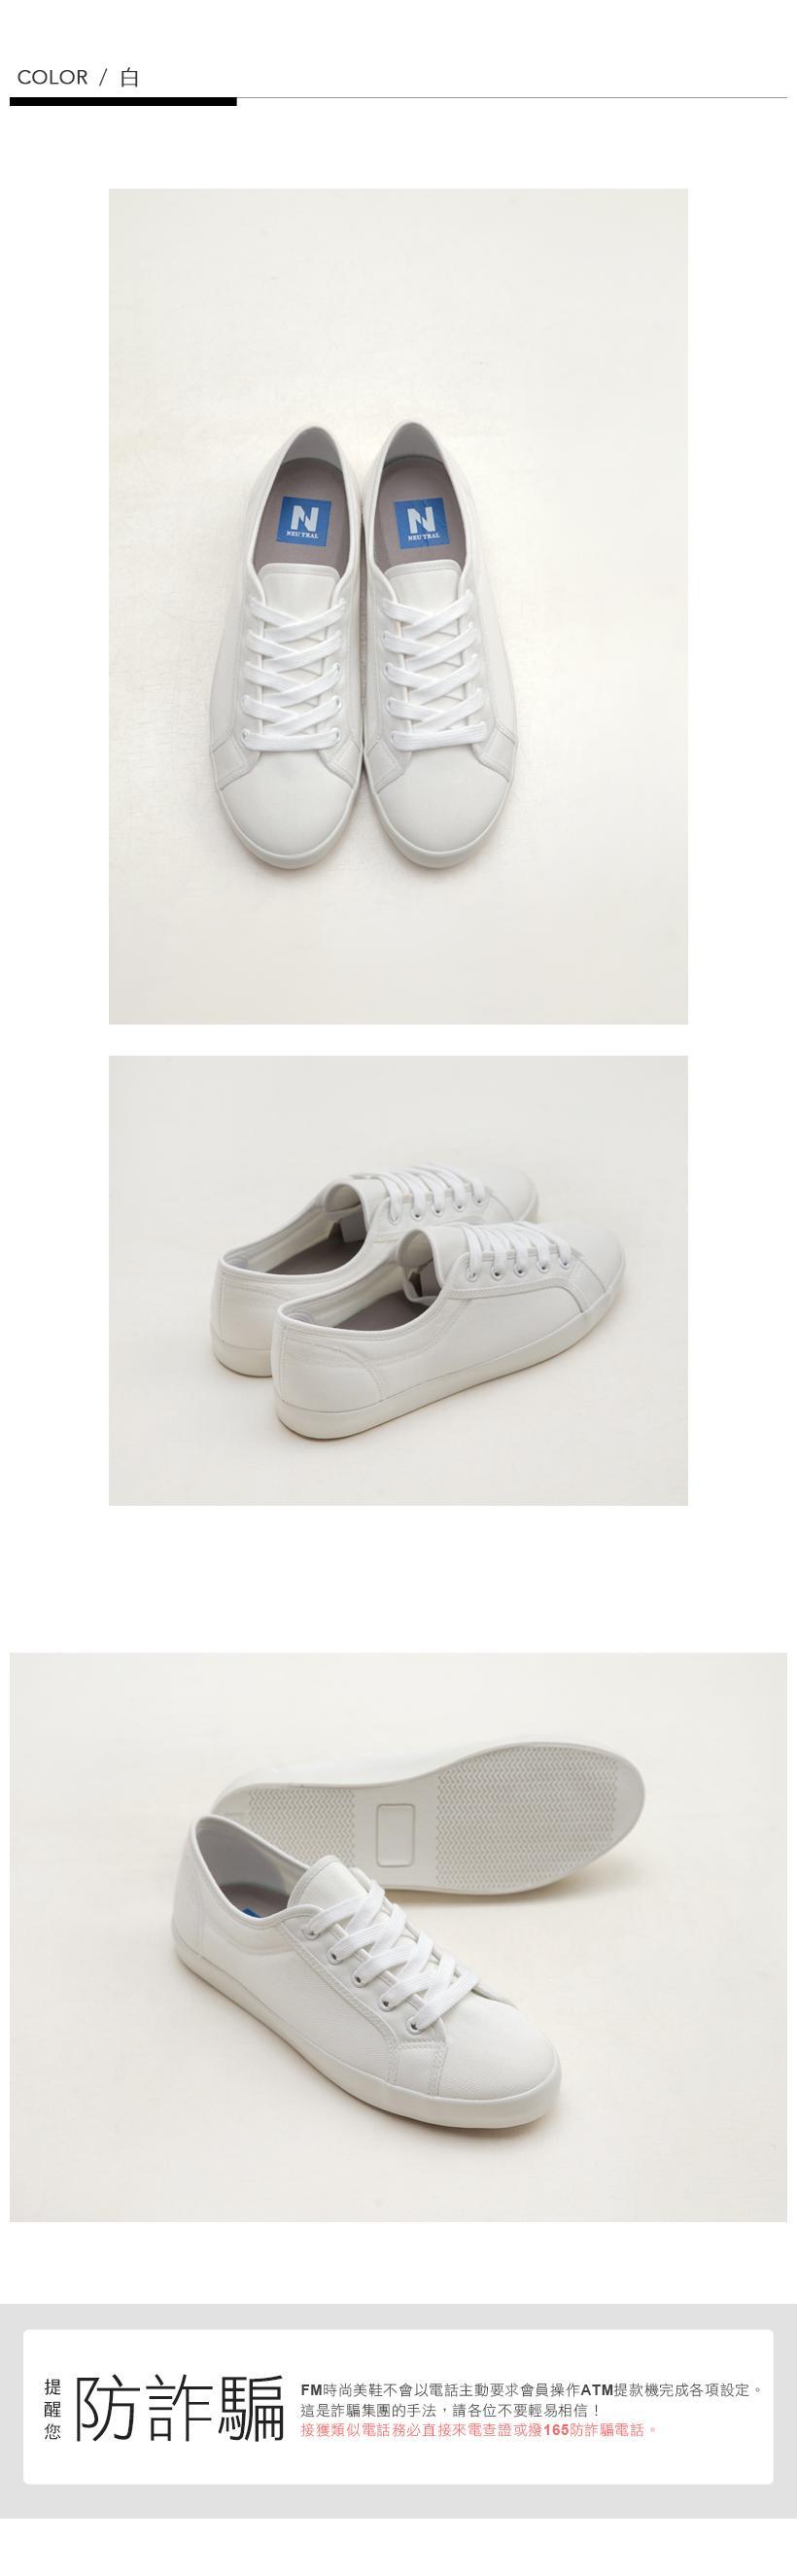 NeuTral-防潑水棉質小白鞋(粉)-大尺碼